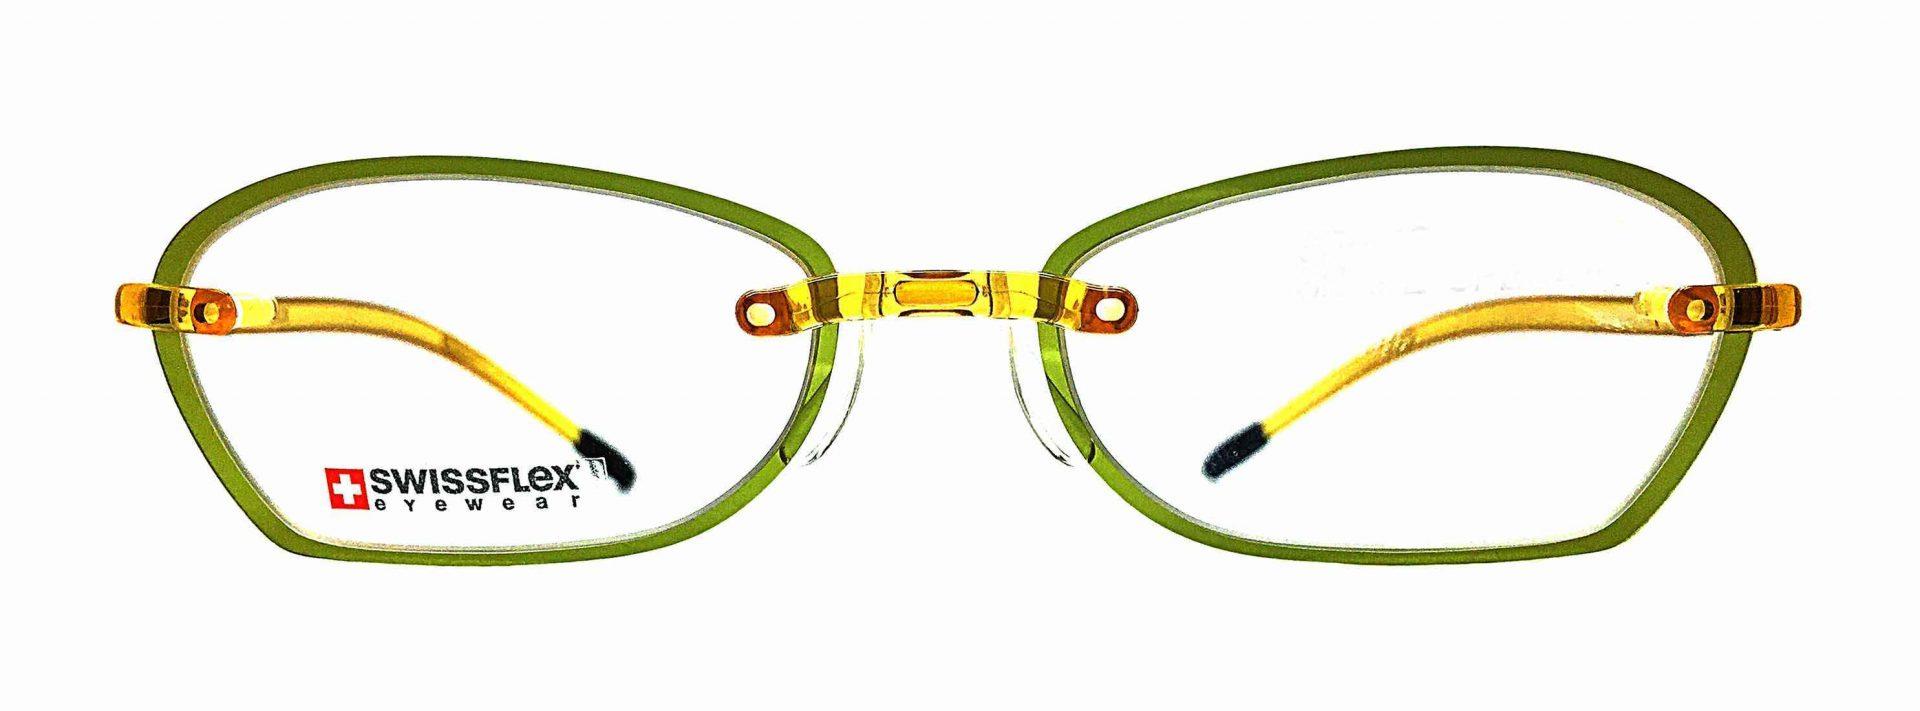 SwissFlex spectacles: SwissFlex Contur 204 51 2970x1100